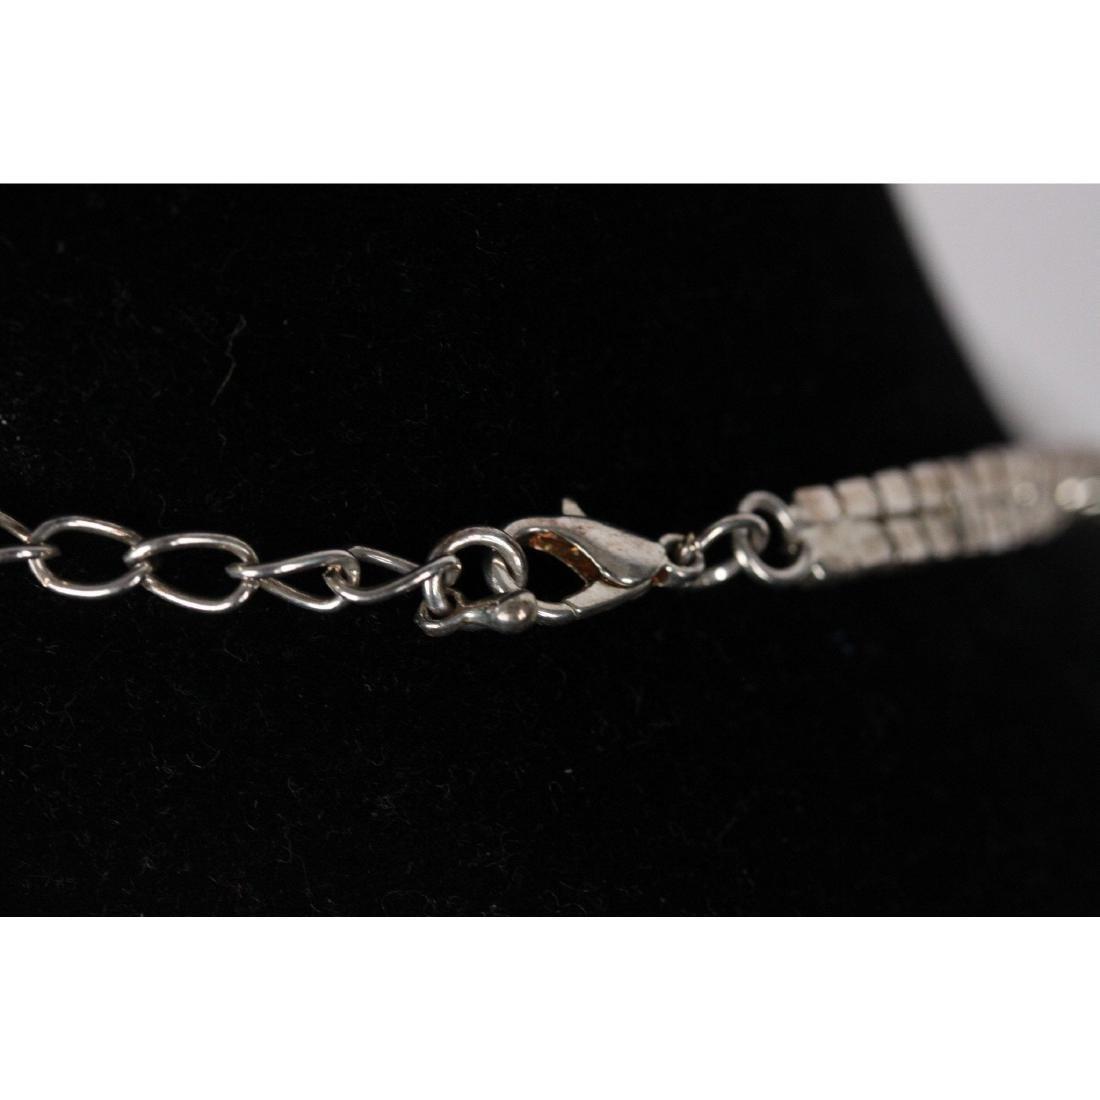 Vintage Pave Rhinestones V Shaped Necklace - 4